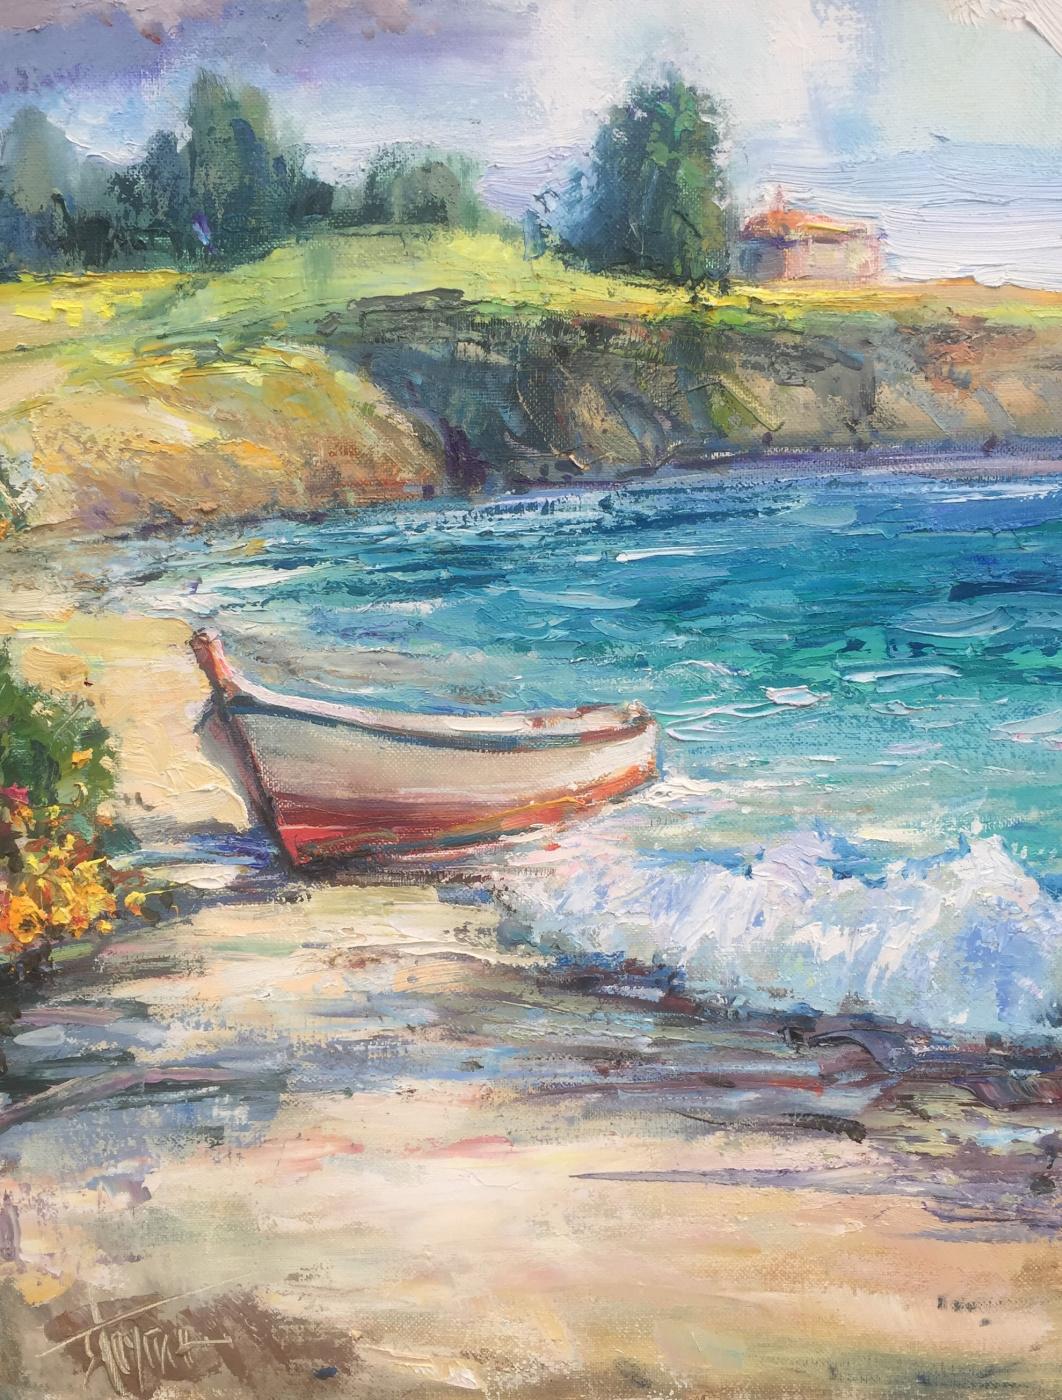 Pavel Tyapugin. A boat